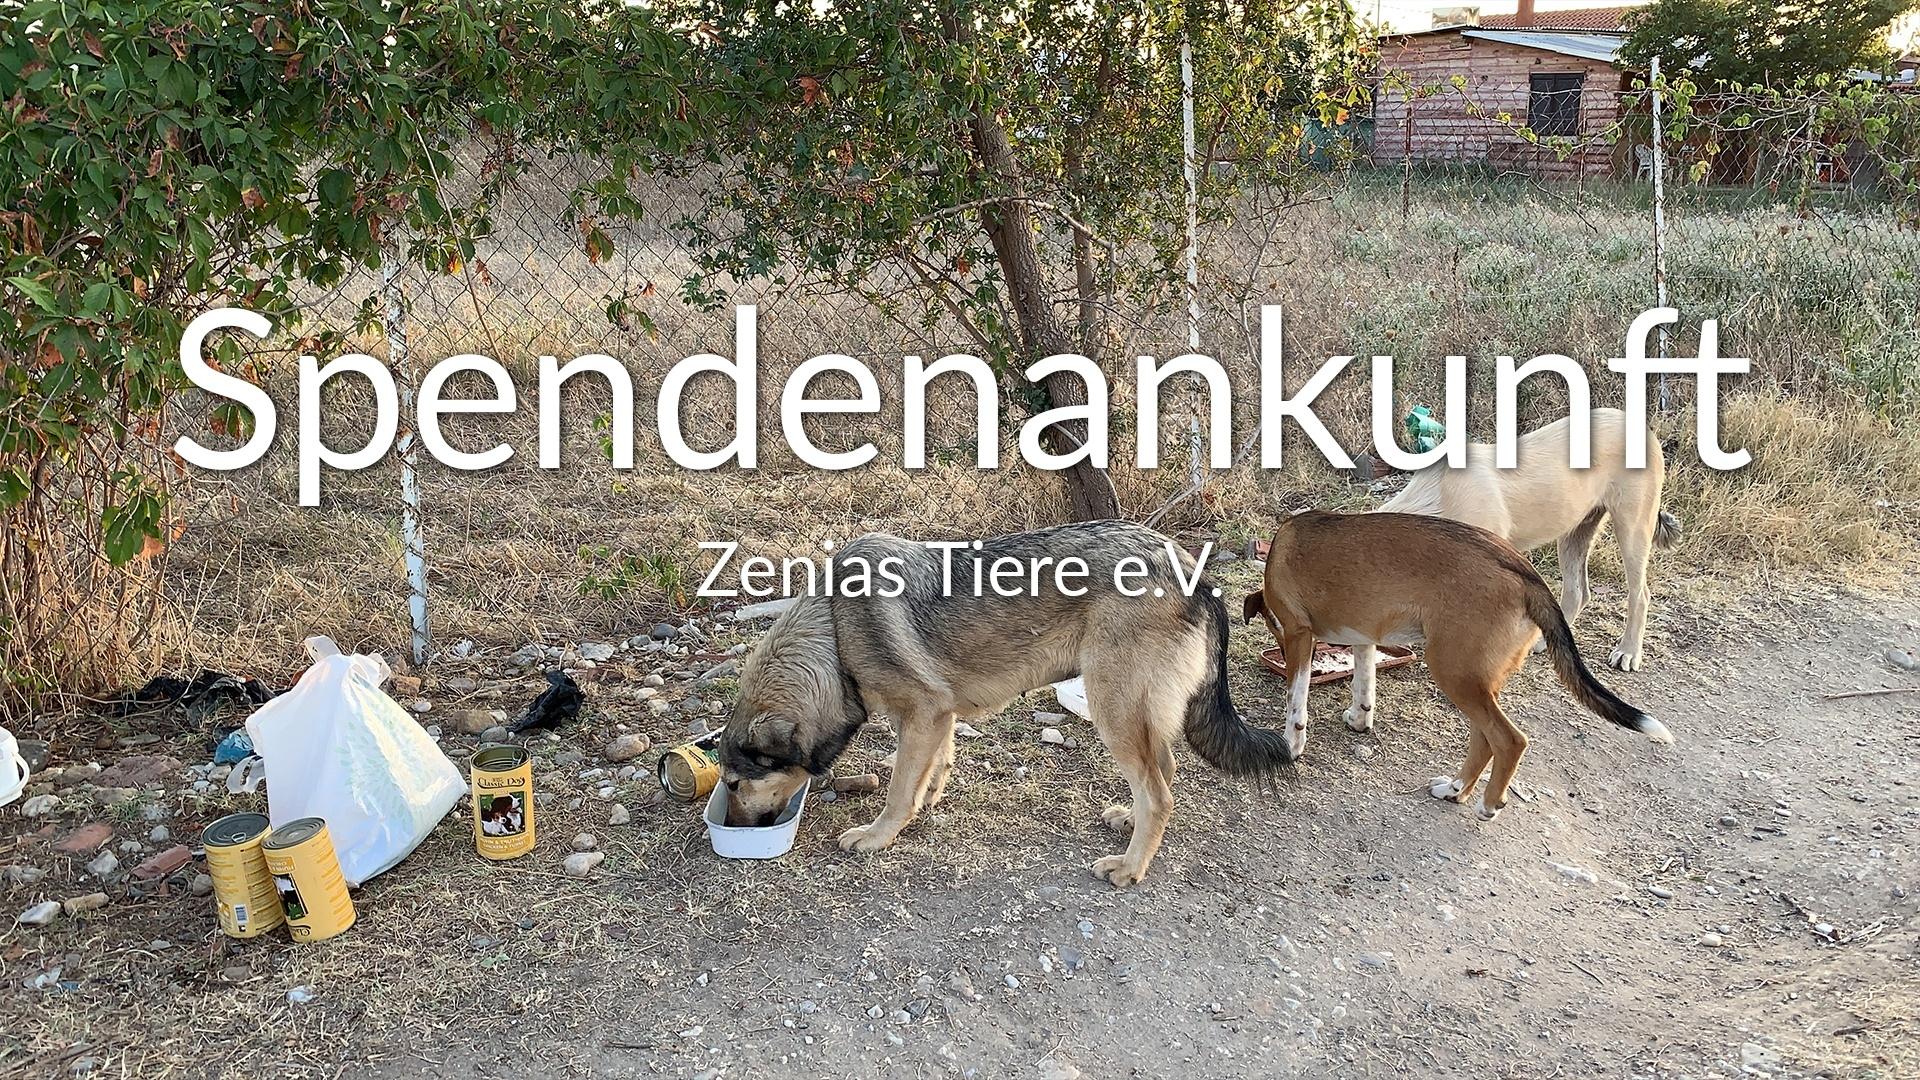 Zenias Tiere e.V.-Futterspendenankunft-september 2019-Spendenaktion-Sommerloch-Griechenland-VIDEO